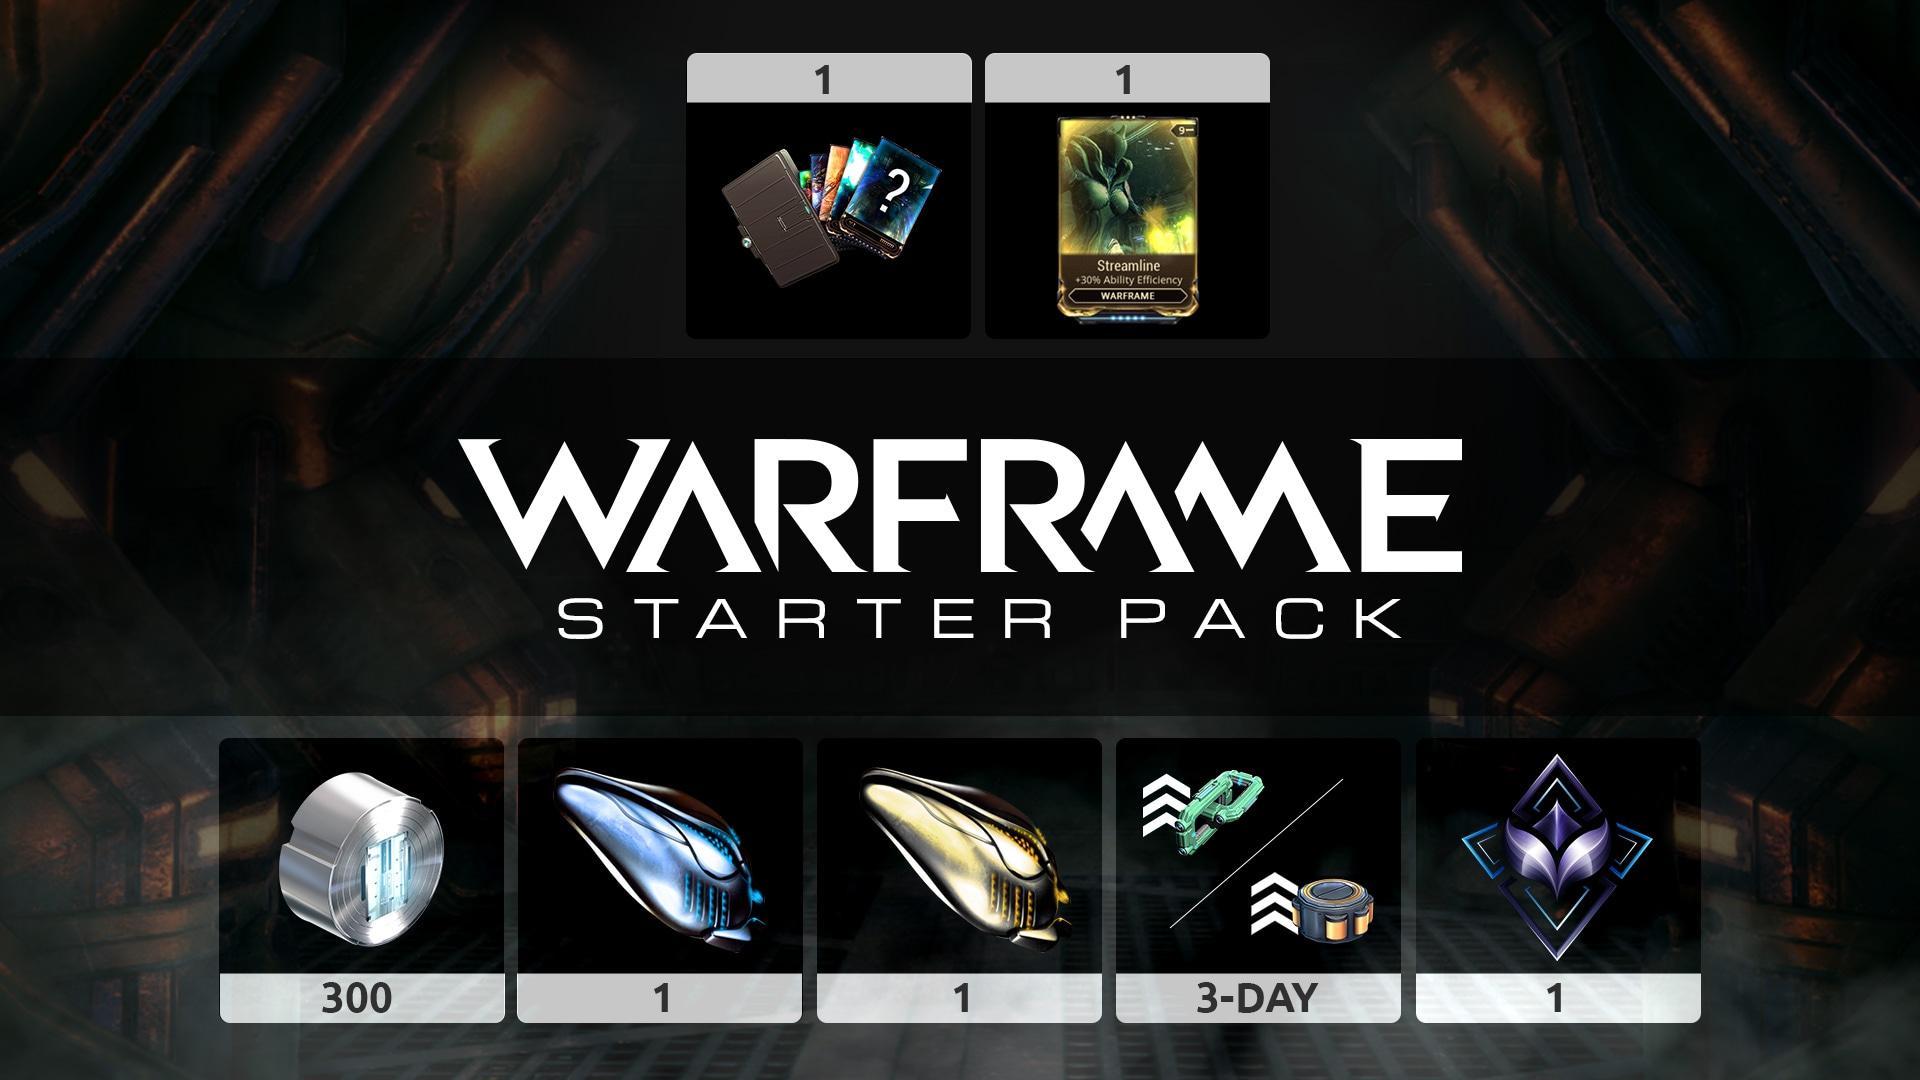 Warframe: Starter Pack (PC) - Warframe Key - GLOBAL - 3